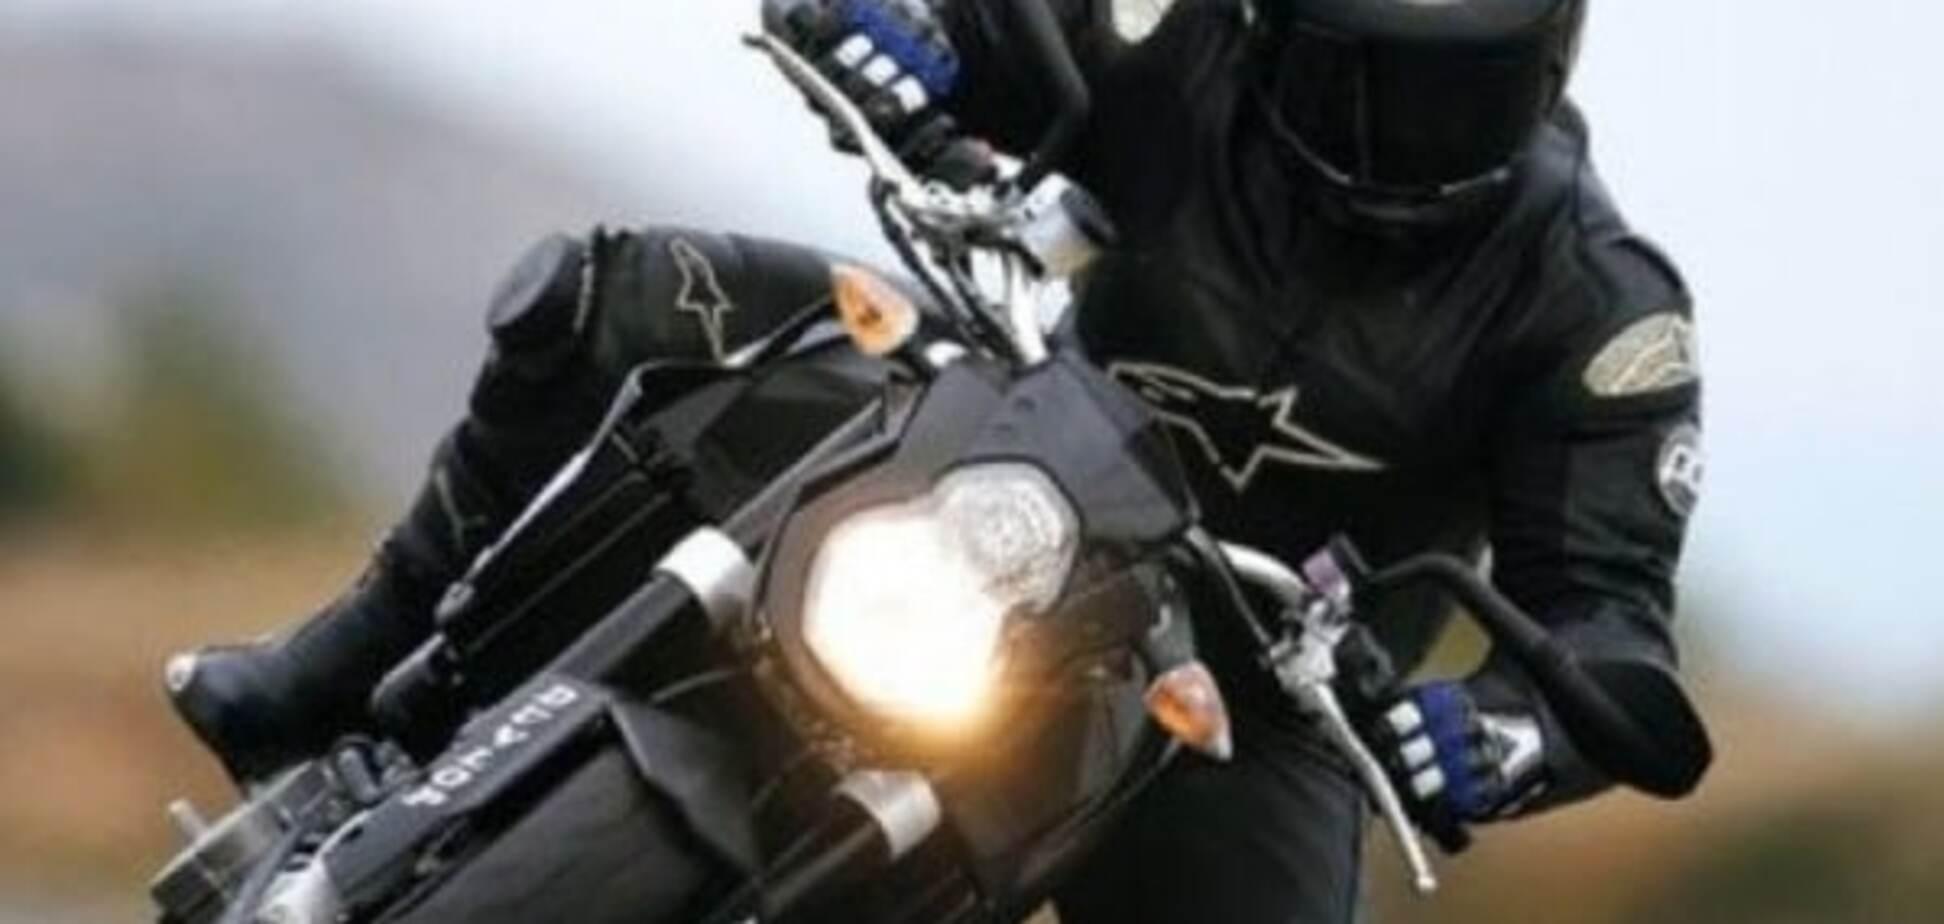 Банда на мотоциклах